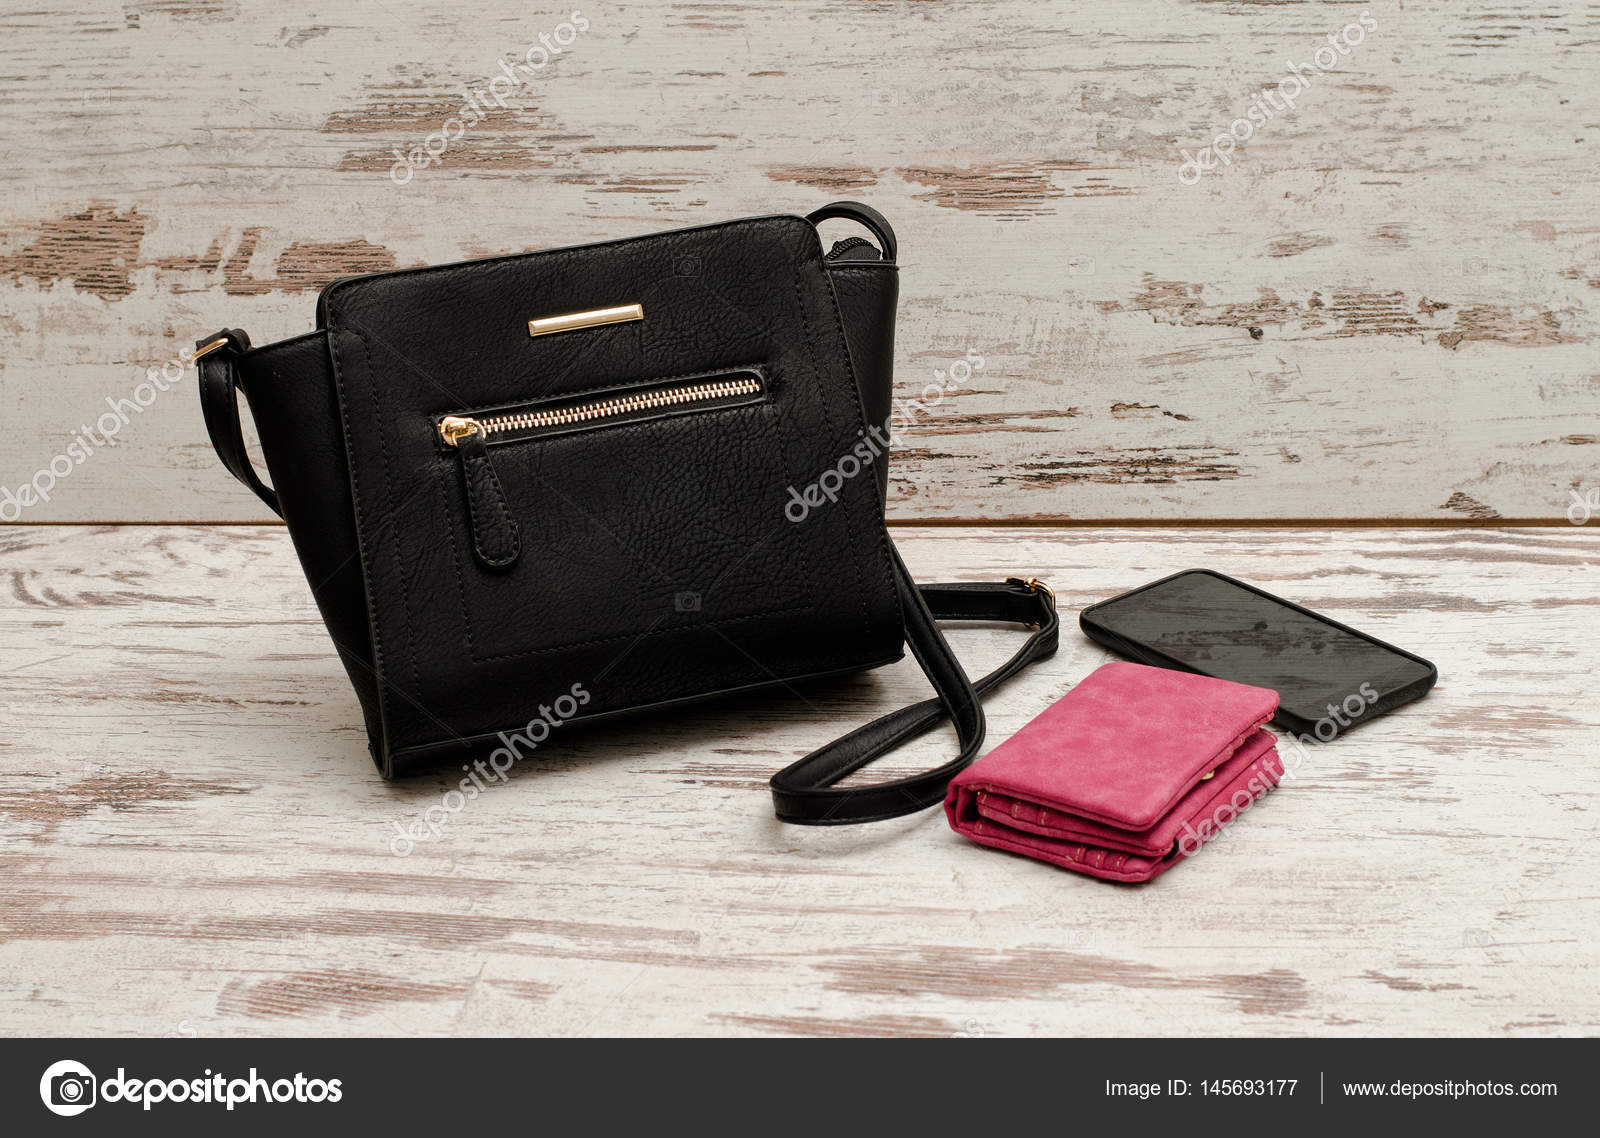 3ef7ad3a91 Μικρή Μαύρη γυναικεία τσάντα